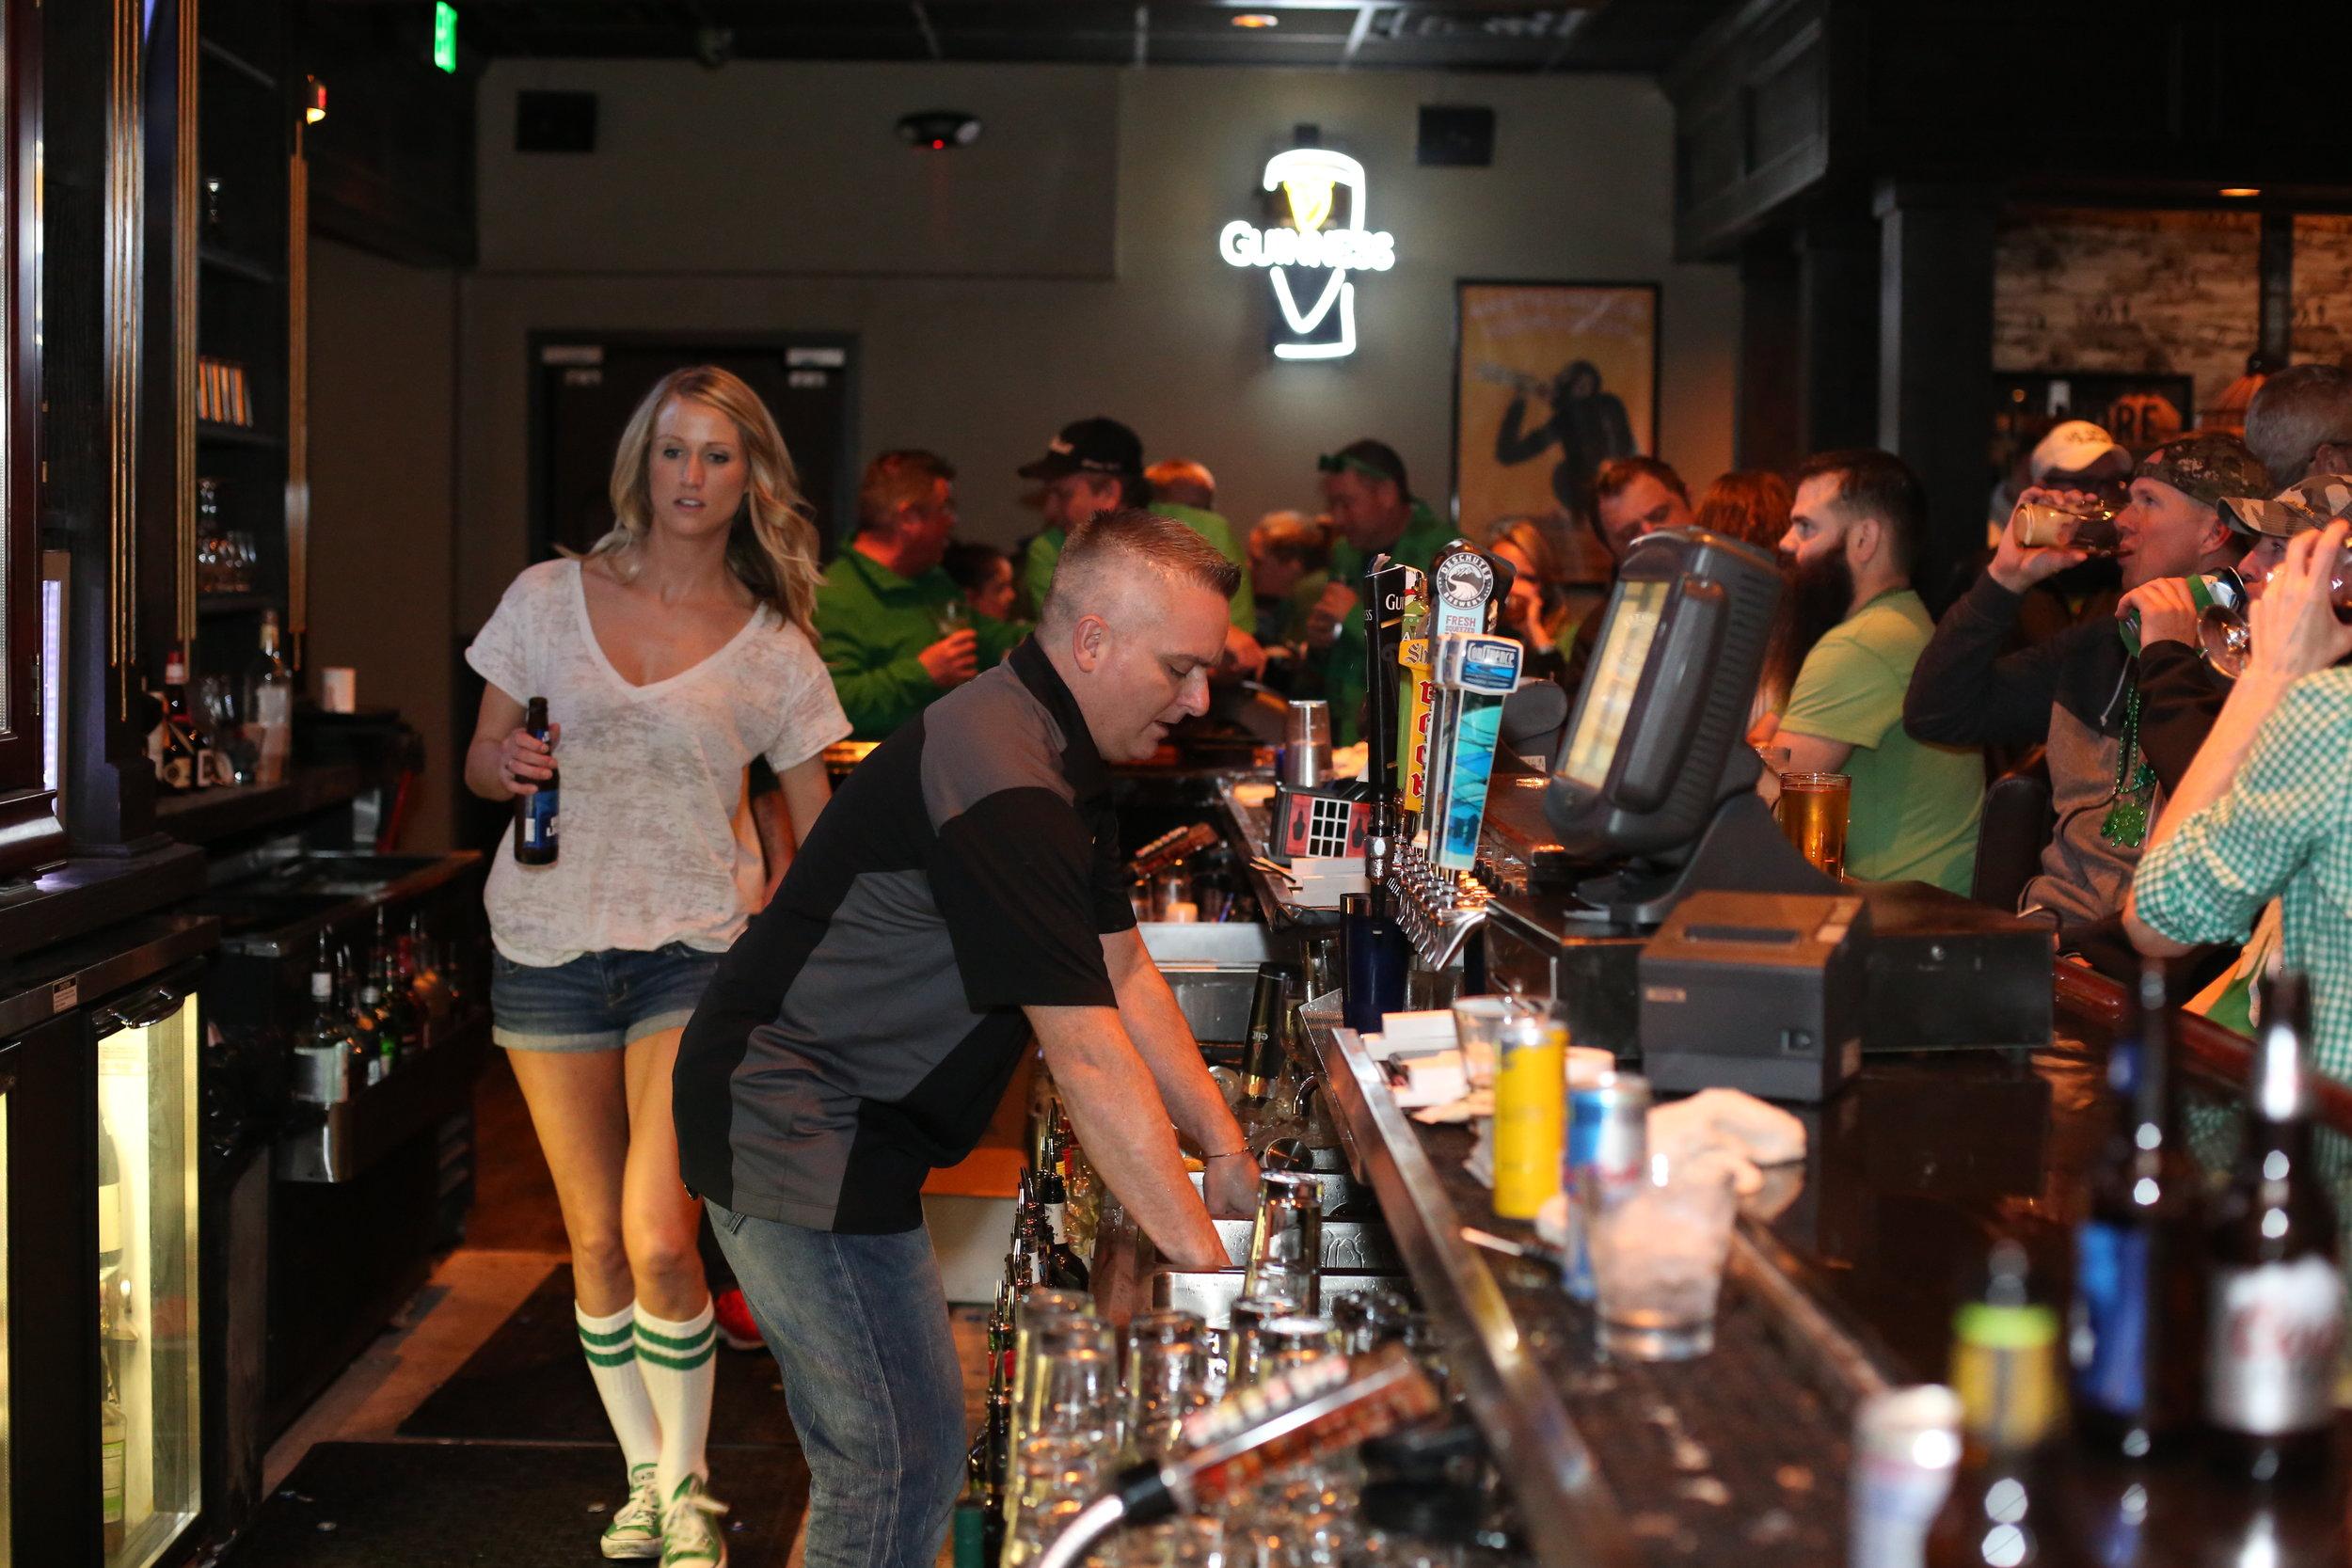 The Irish - A bar and pub in WDM